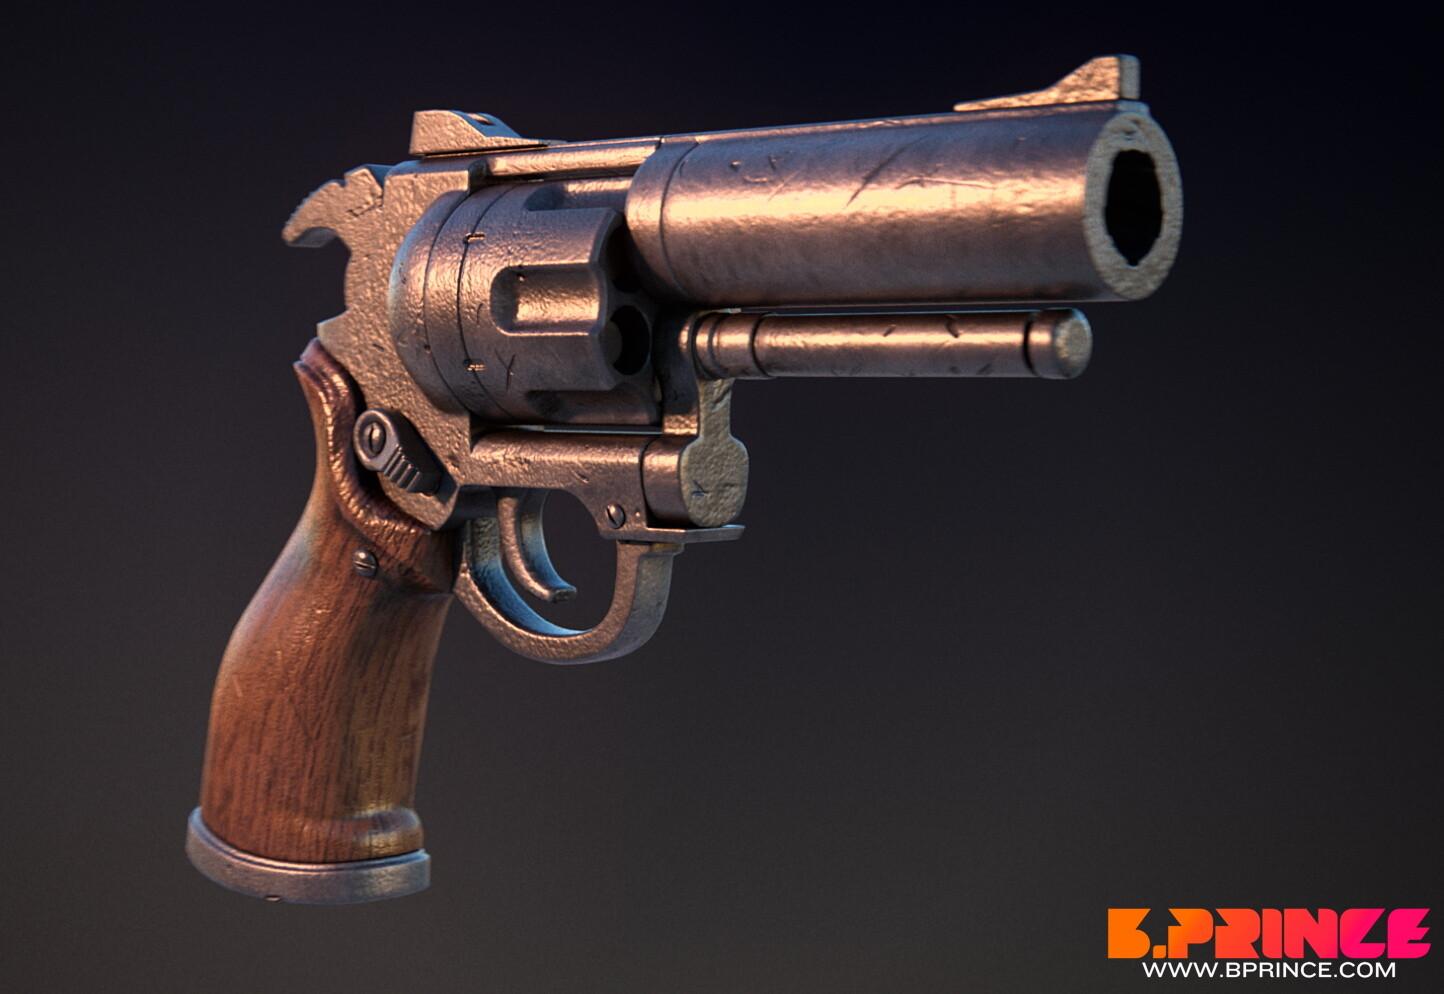 The Goon's revolver